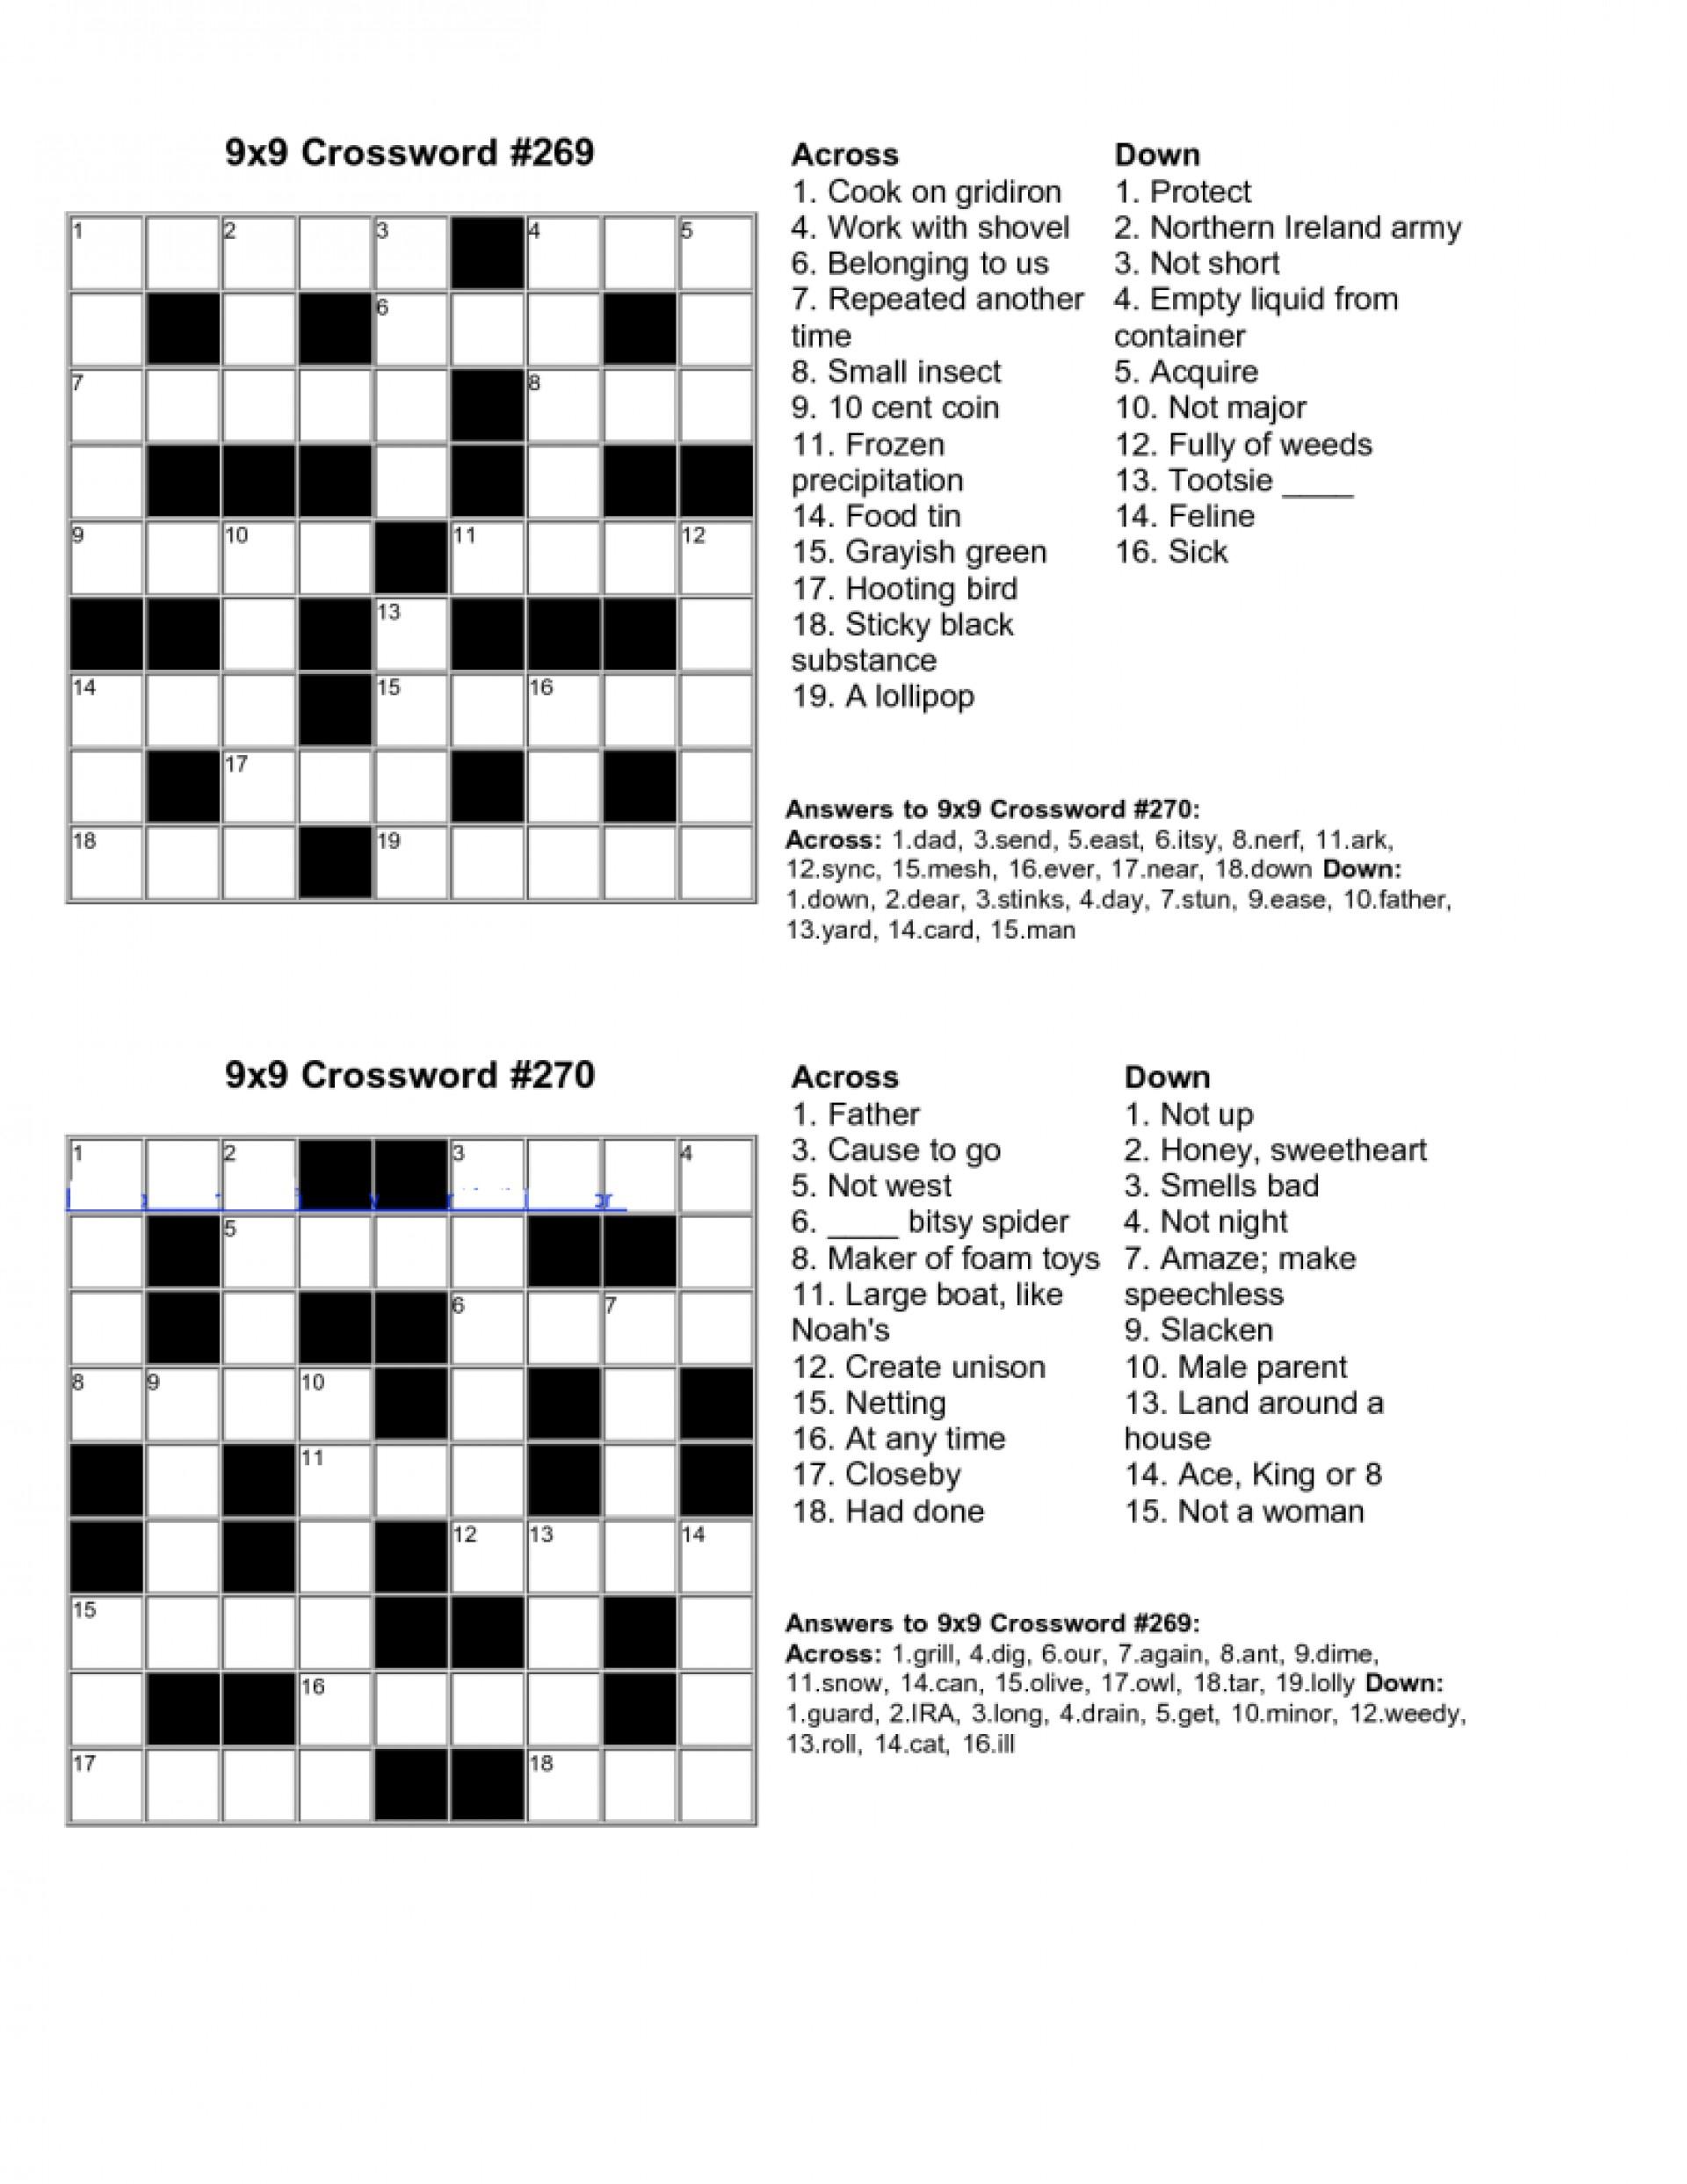 Free Crossword Puzzle Maker Printable - Stepindance.fr - Make Your Own Crossword Puzzle Free Printable